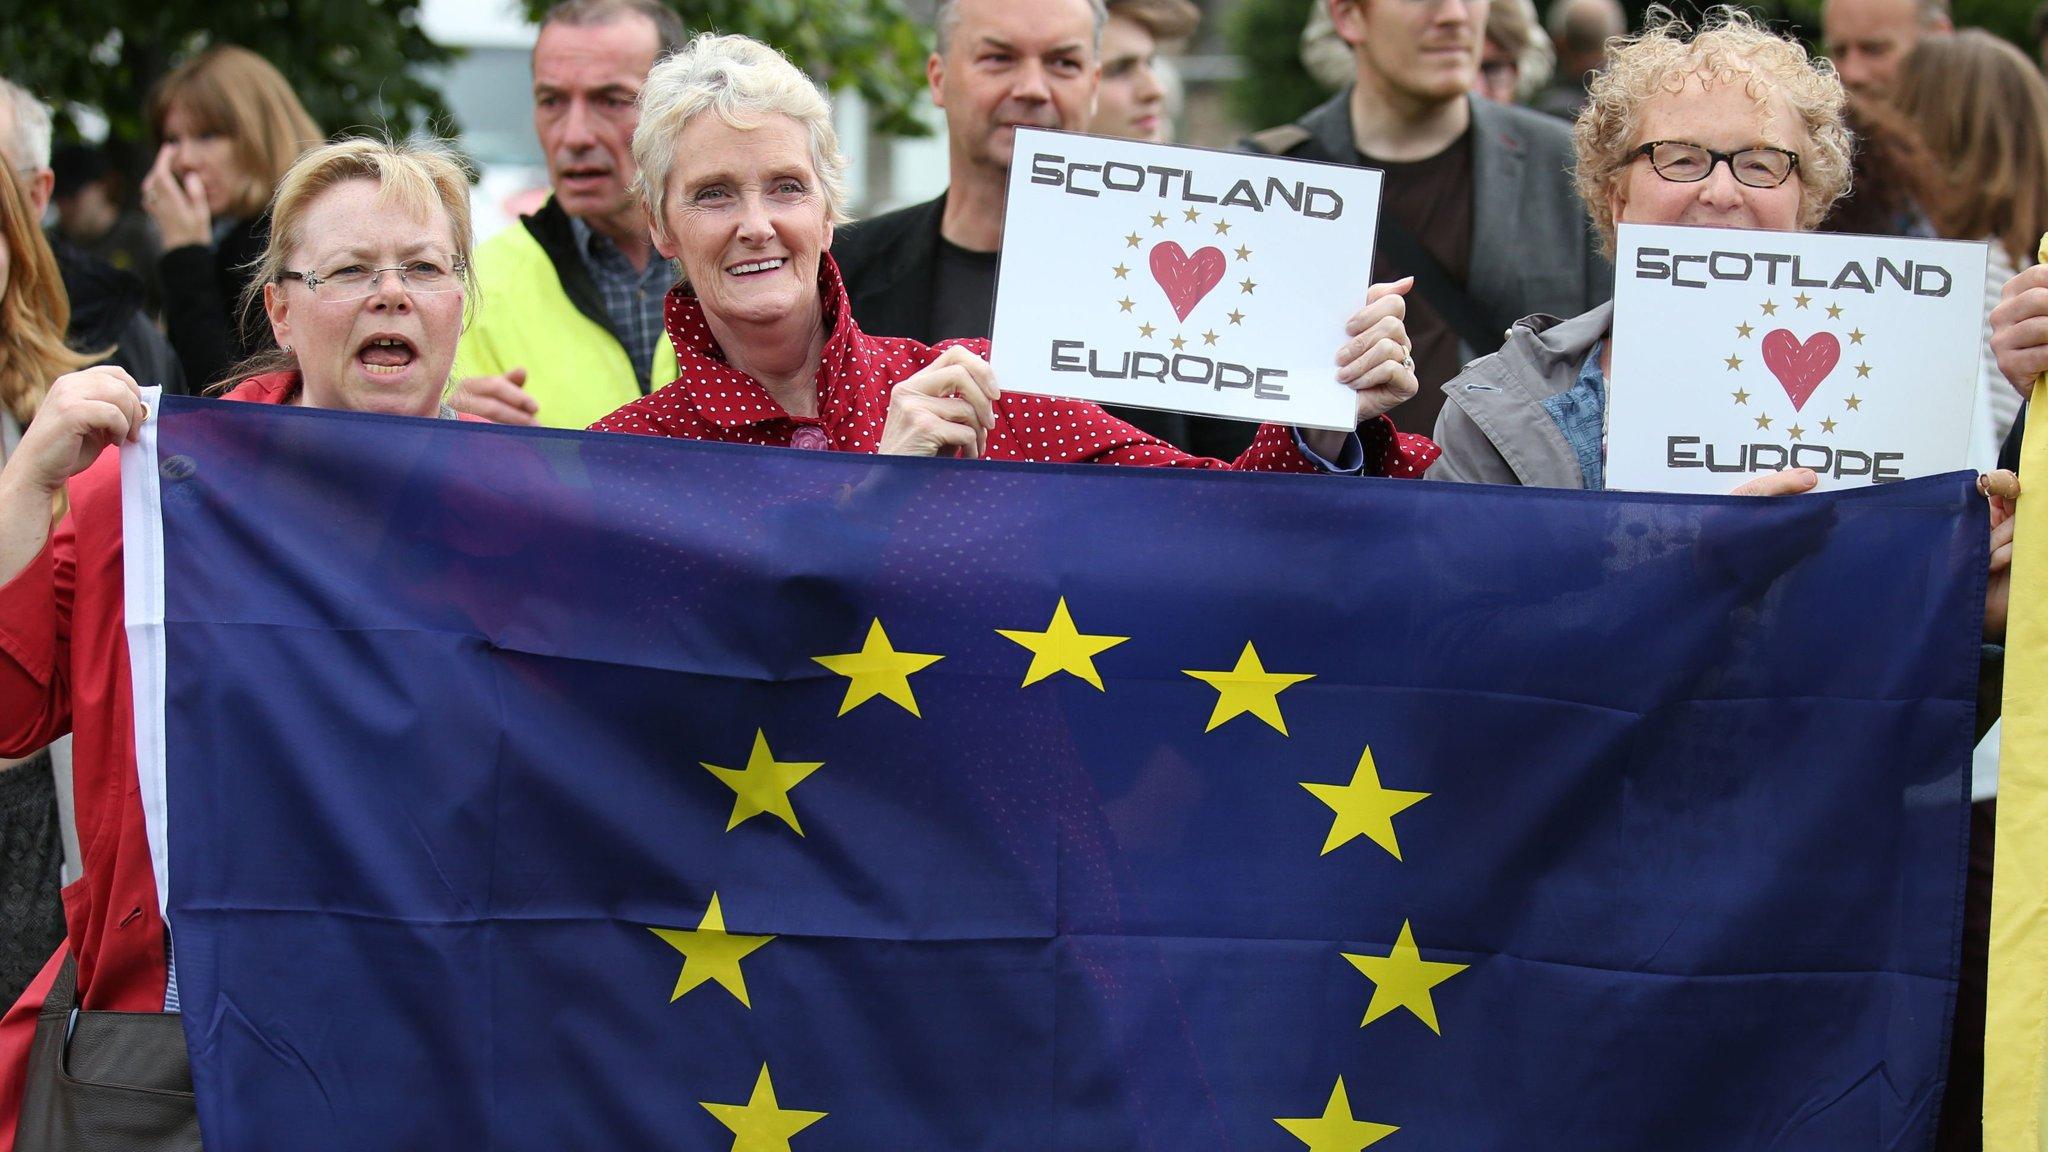 Please Help, scottish referendum?